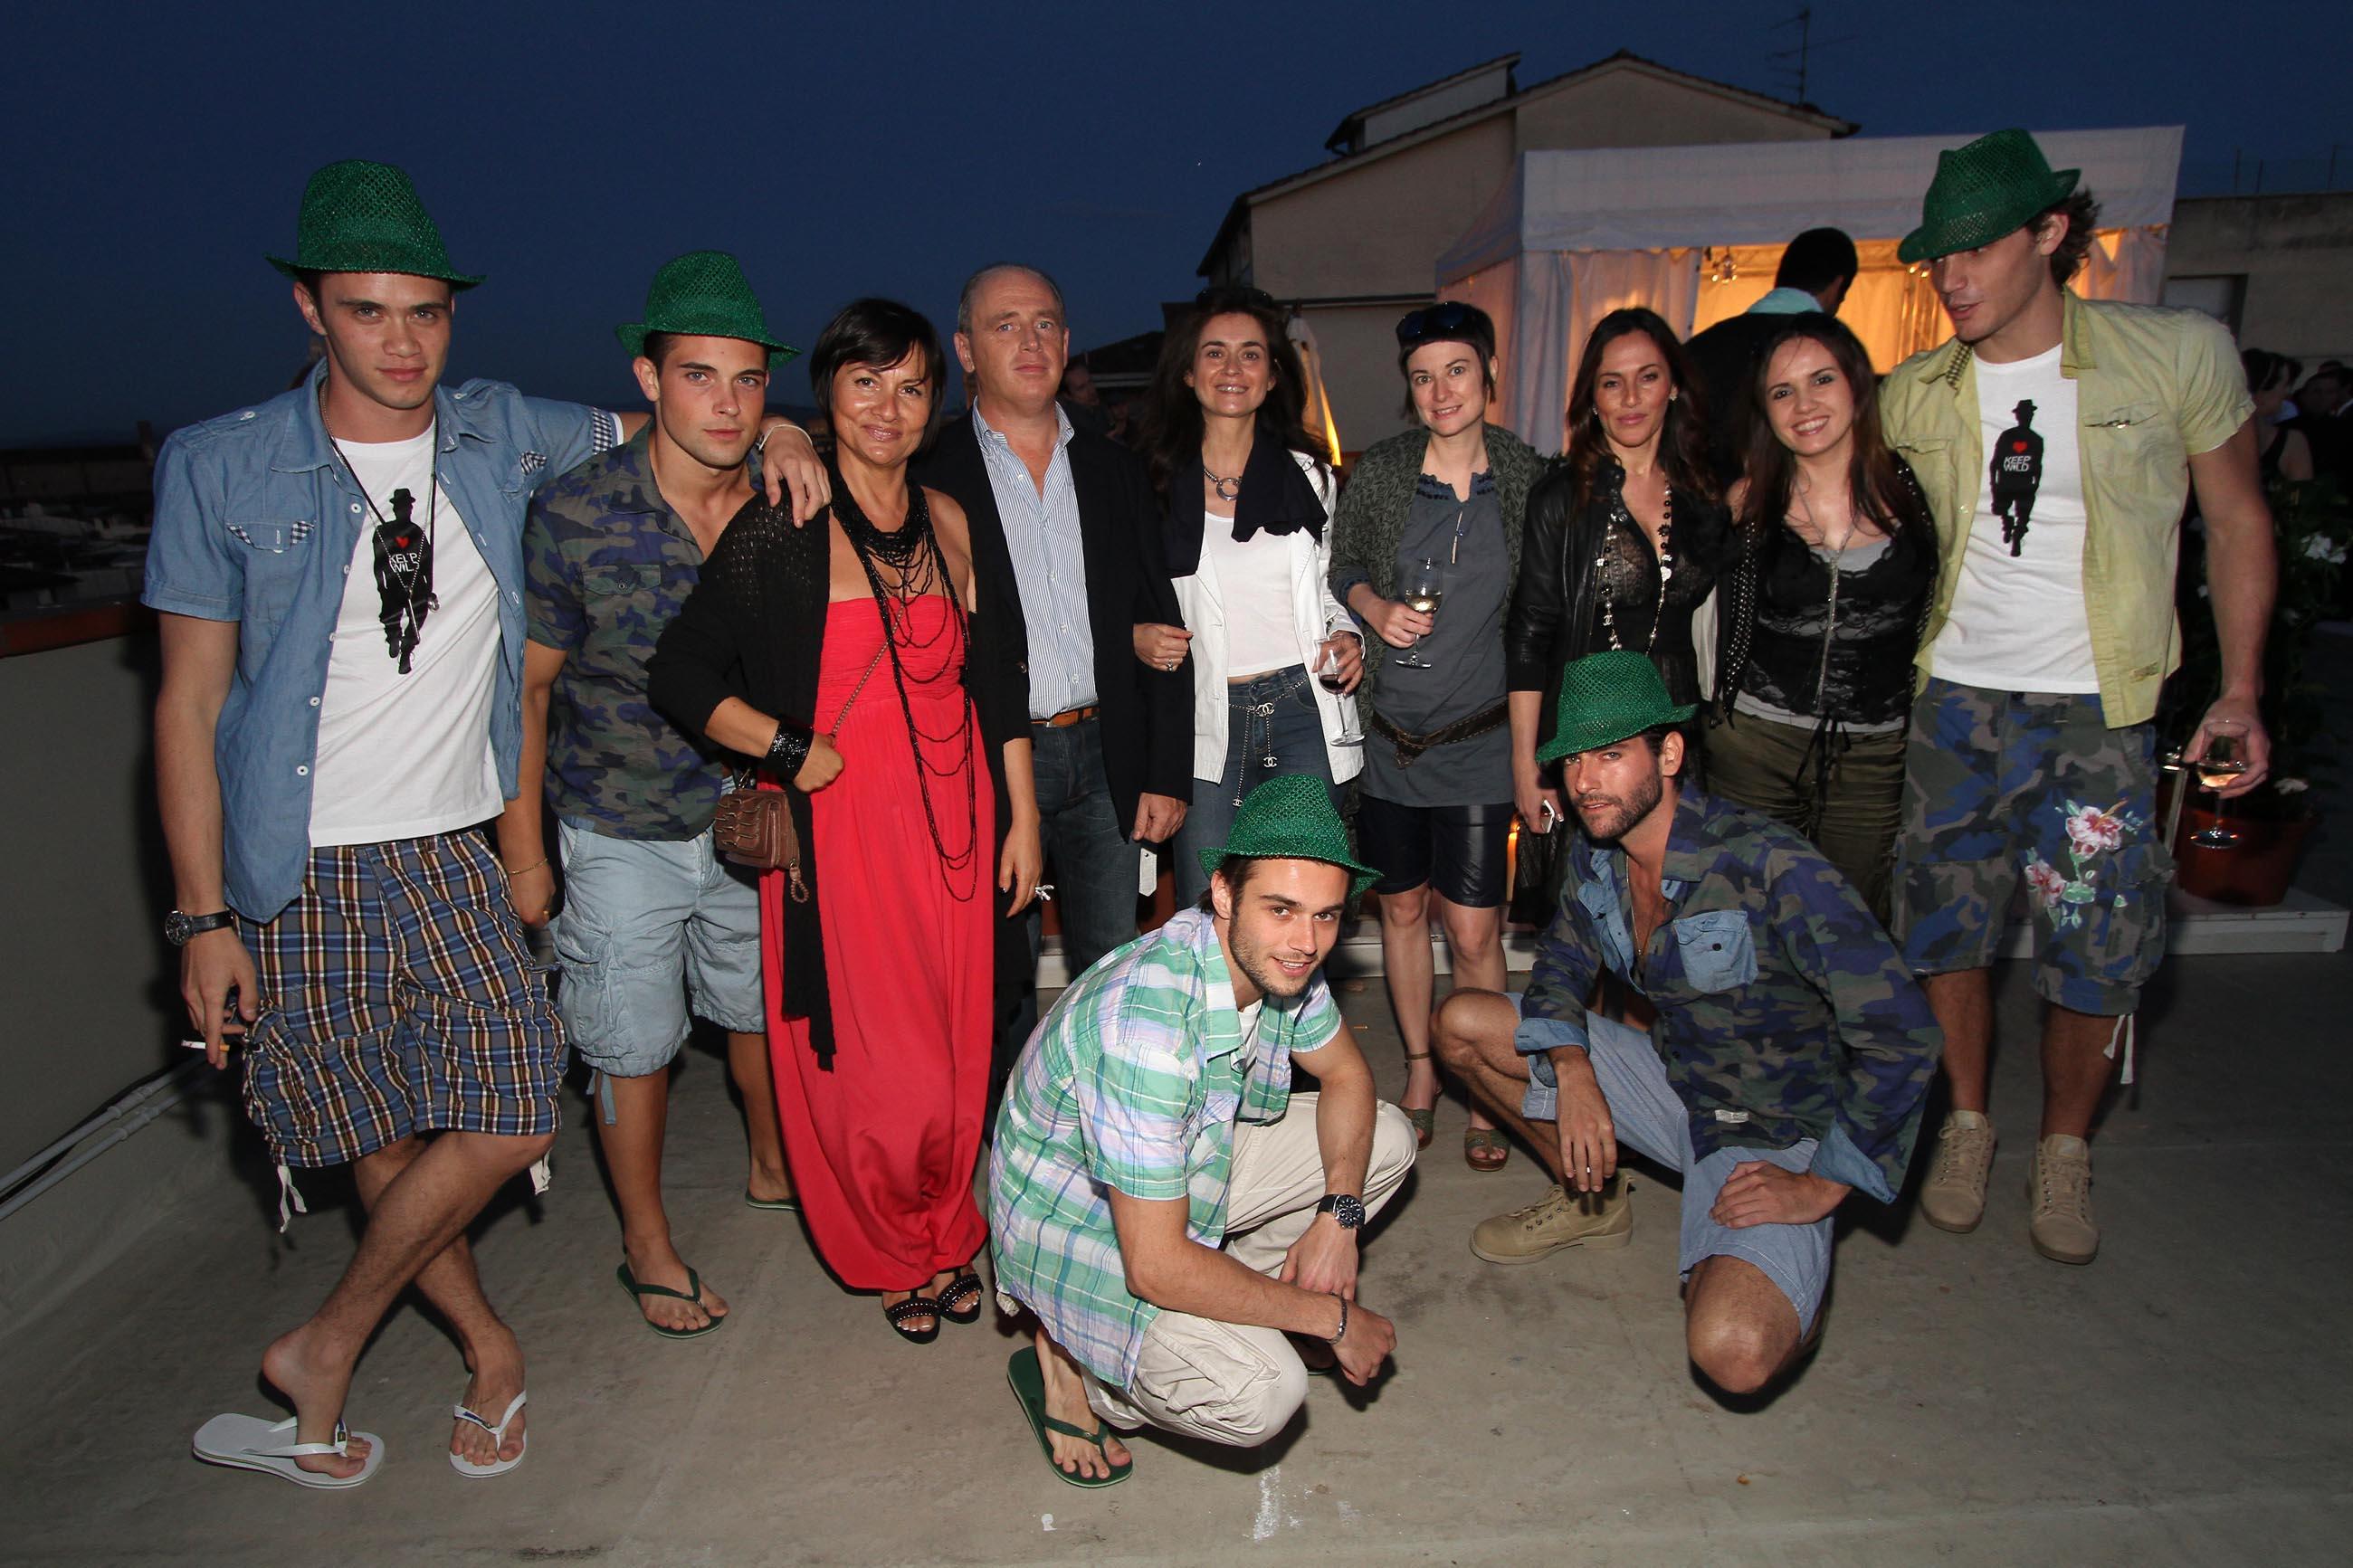 PRESSPHOTO Firenze, Garage Europa, evento Keep Wild. Nella foto Nadia Testi, Natasha Elfring, Andrea Bacci, Anna Boccoli e Laura Magni + modelli